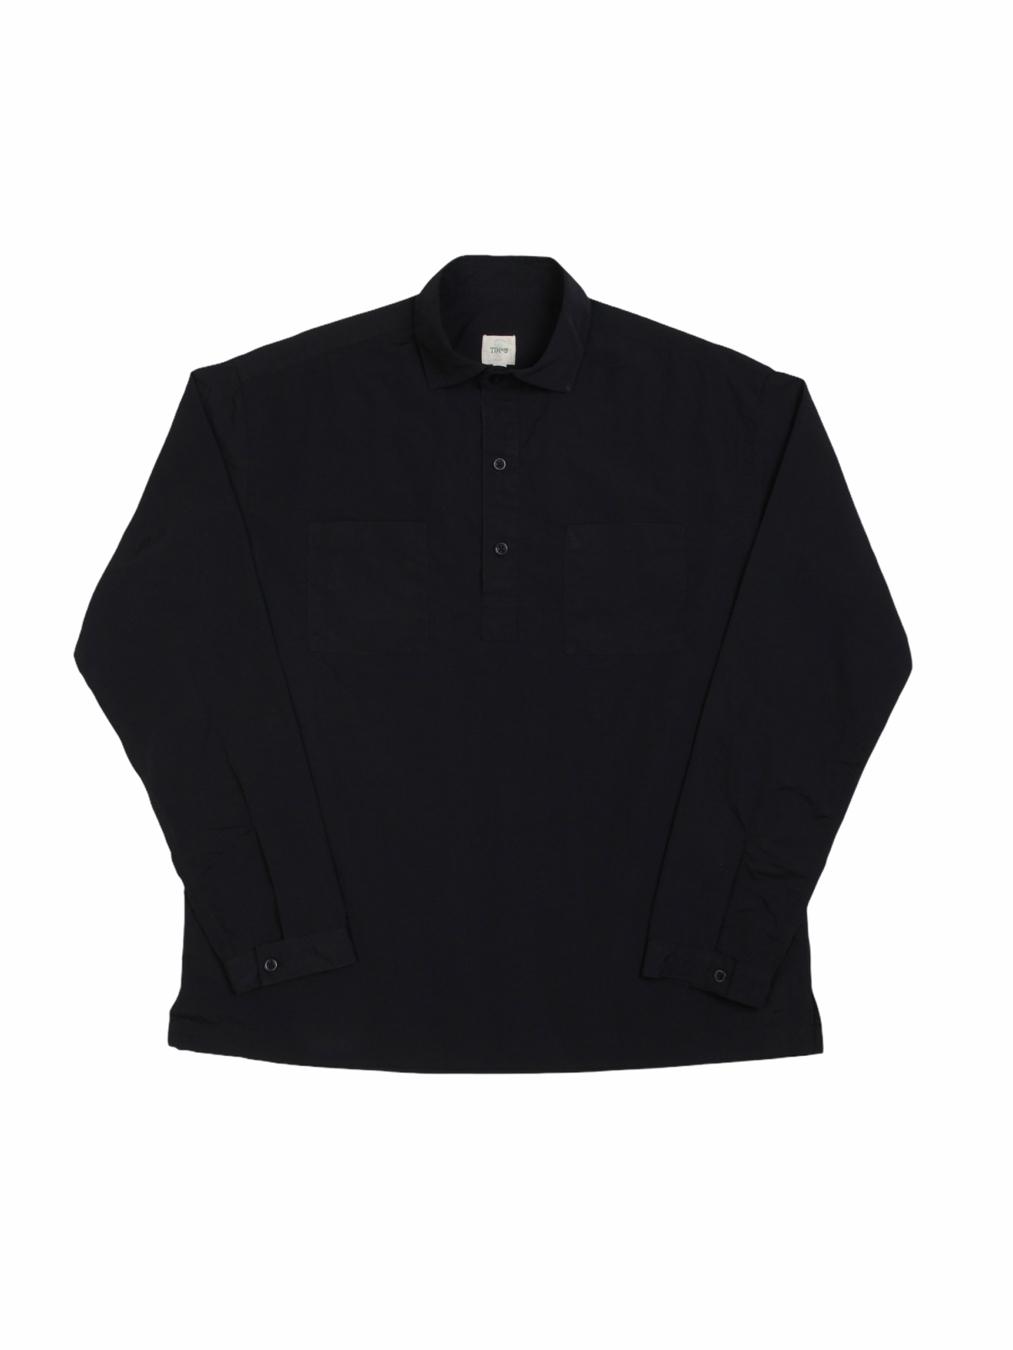 Nylon Pullover Shirts (Black)